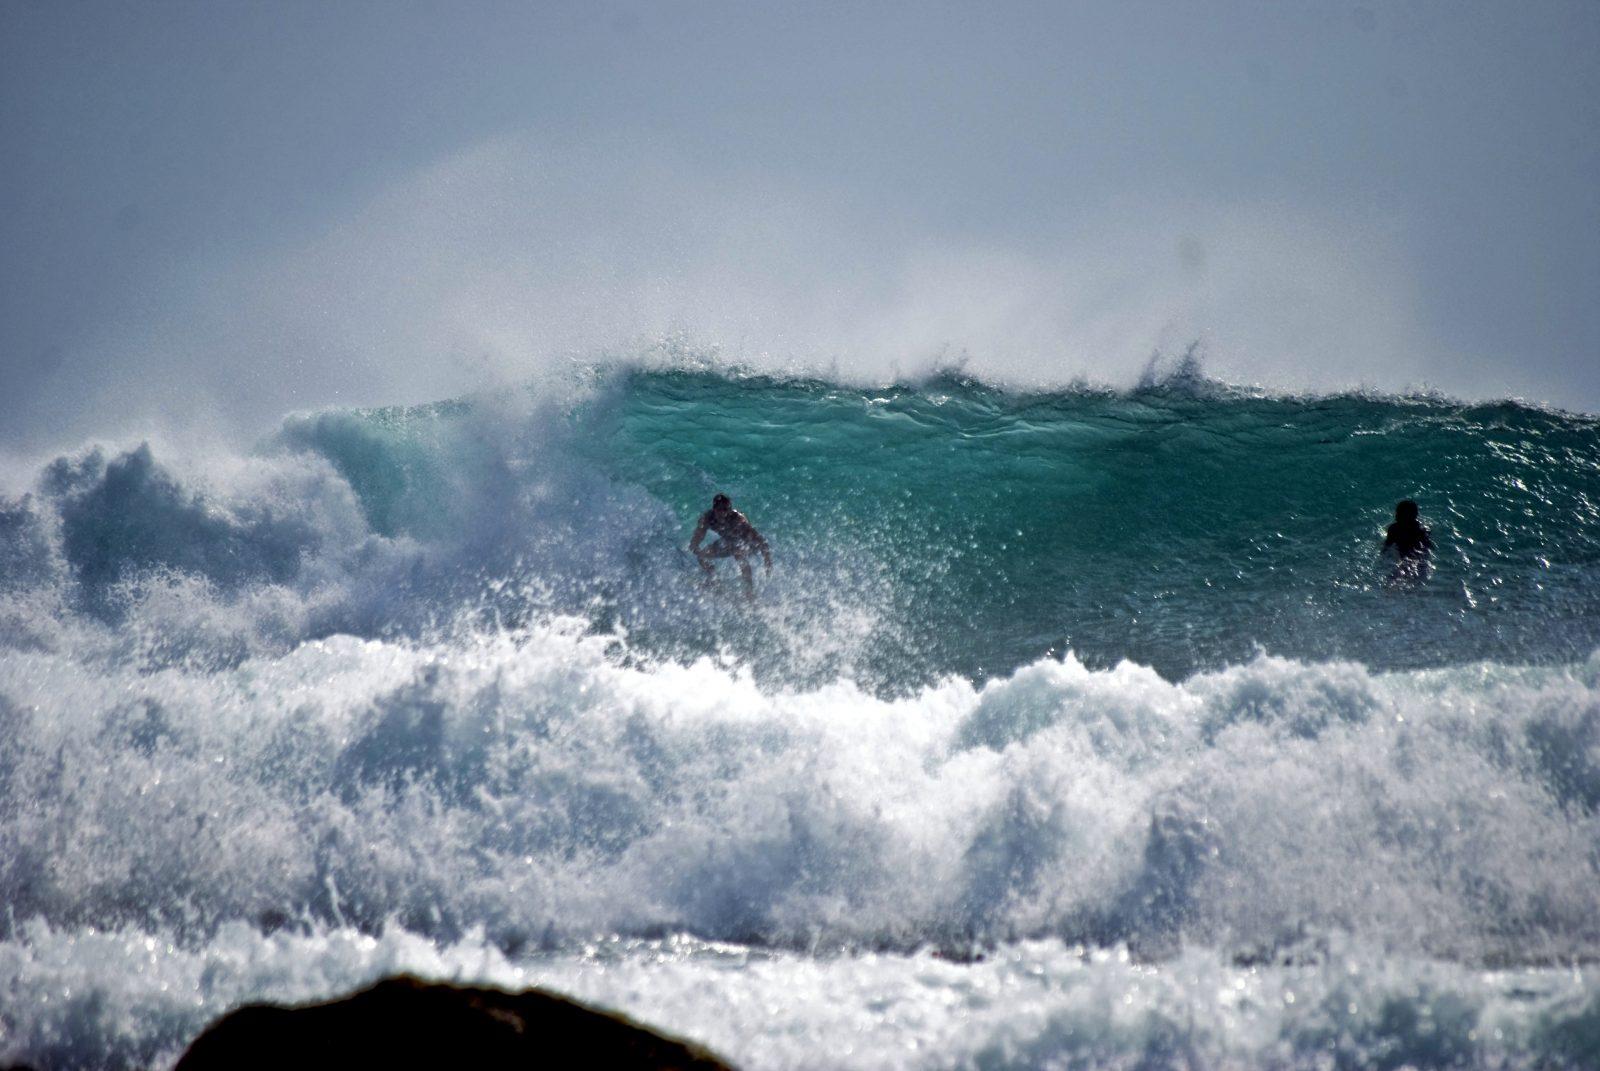 wagaligong-surf-hostel-dulan2-e1465160230498